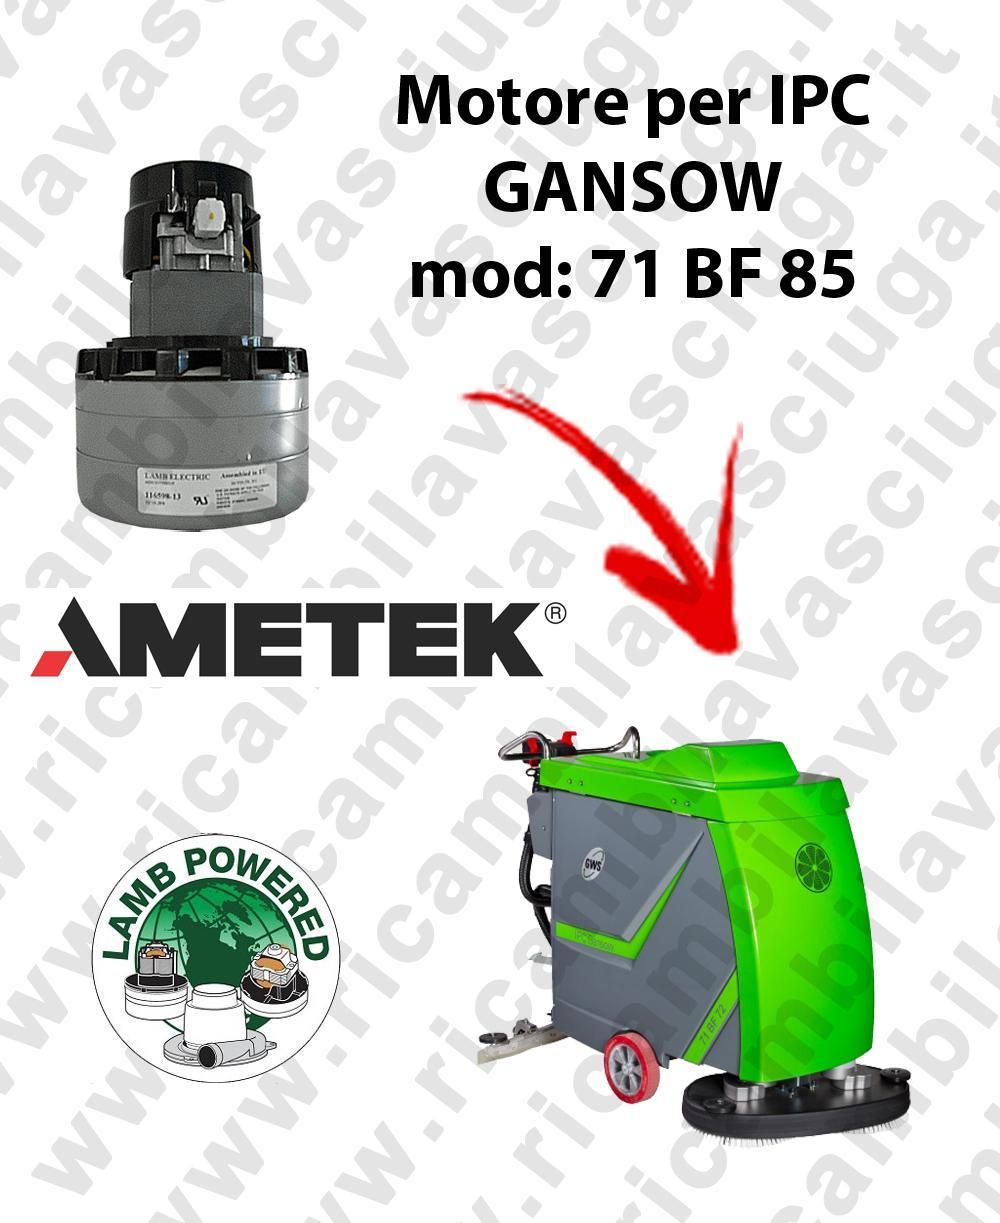 71 BF 85 Motore de aspiración LAMB AMETEK para fregadora IPC GANSOW